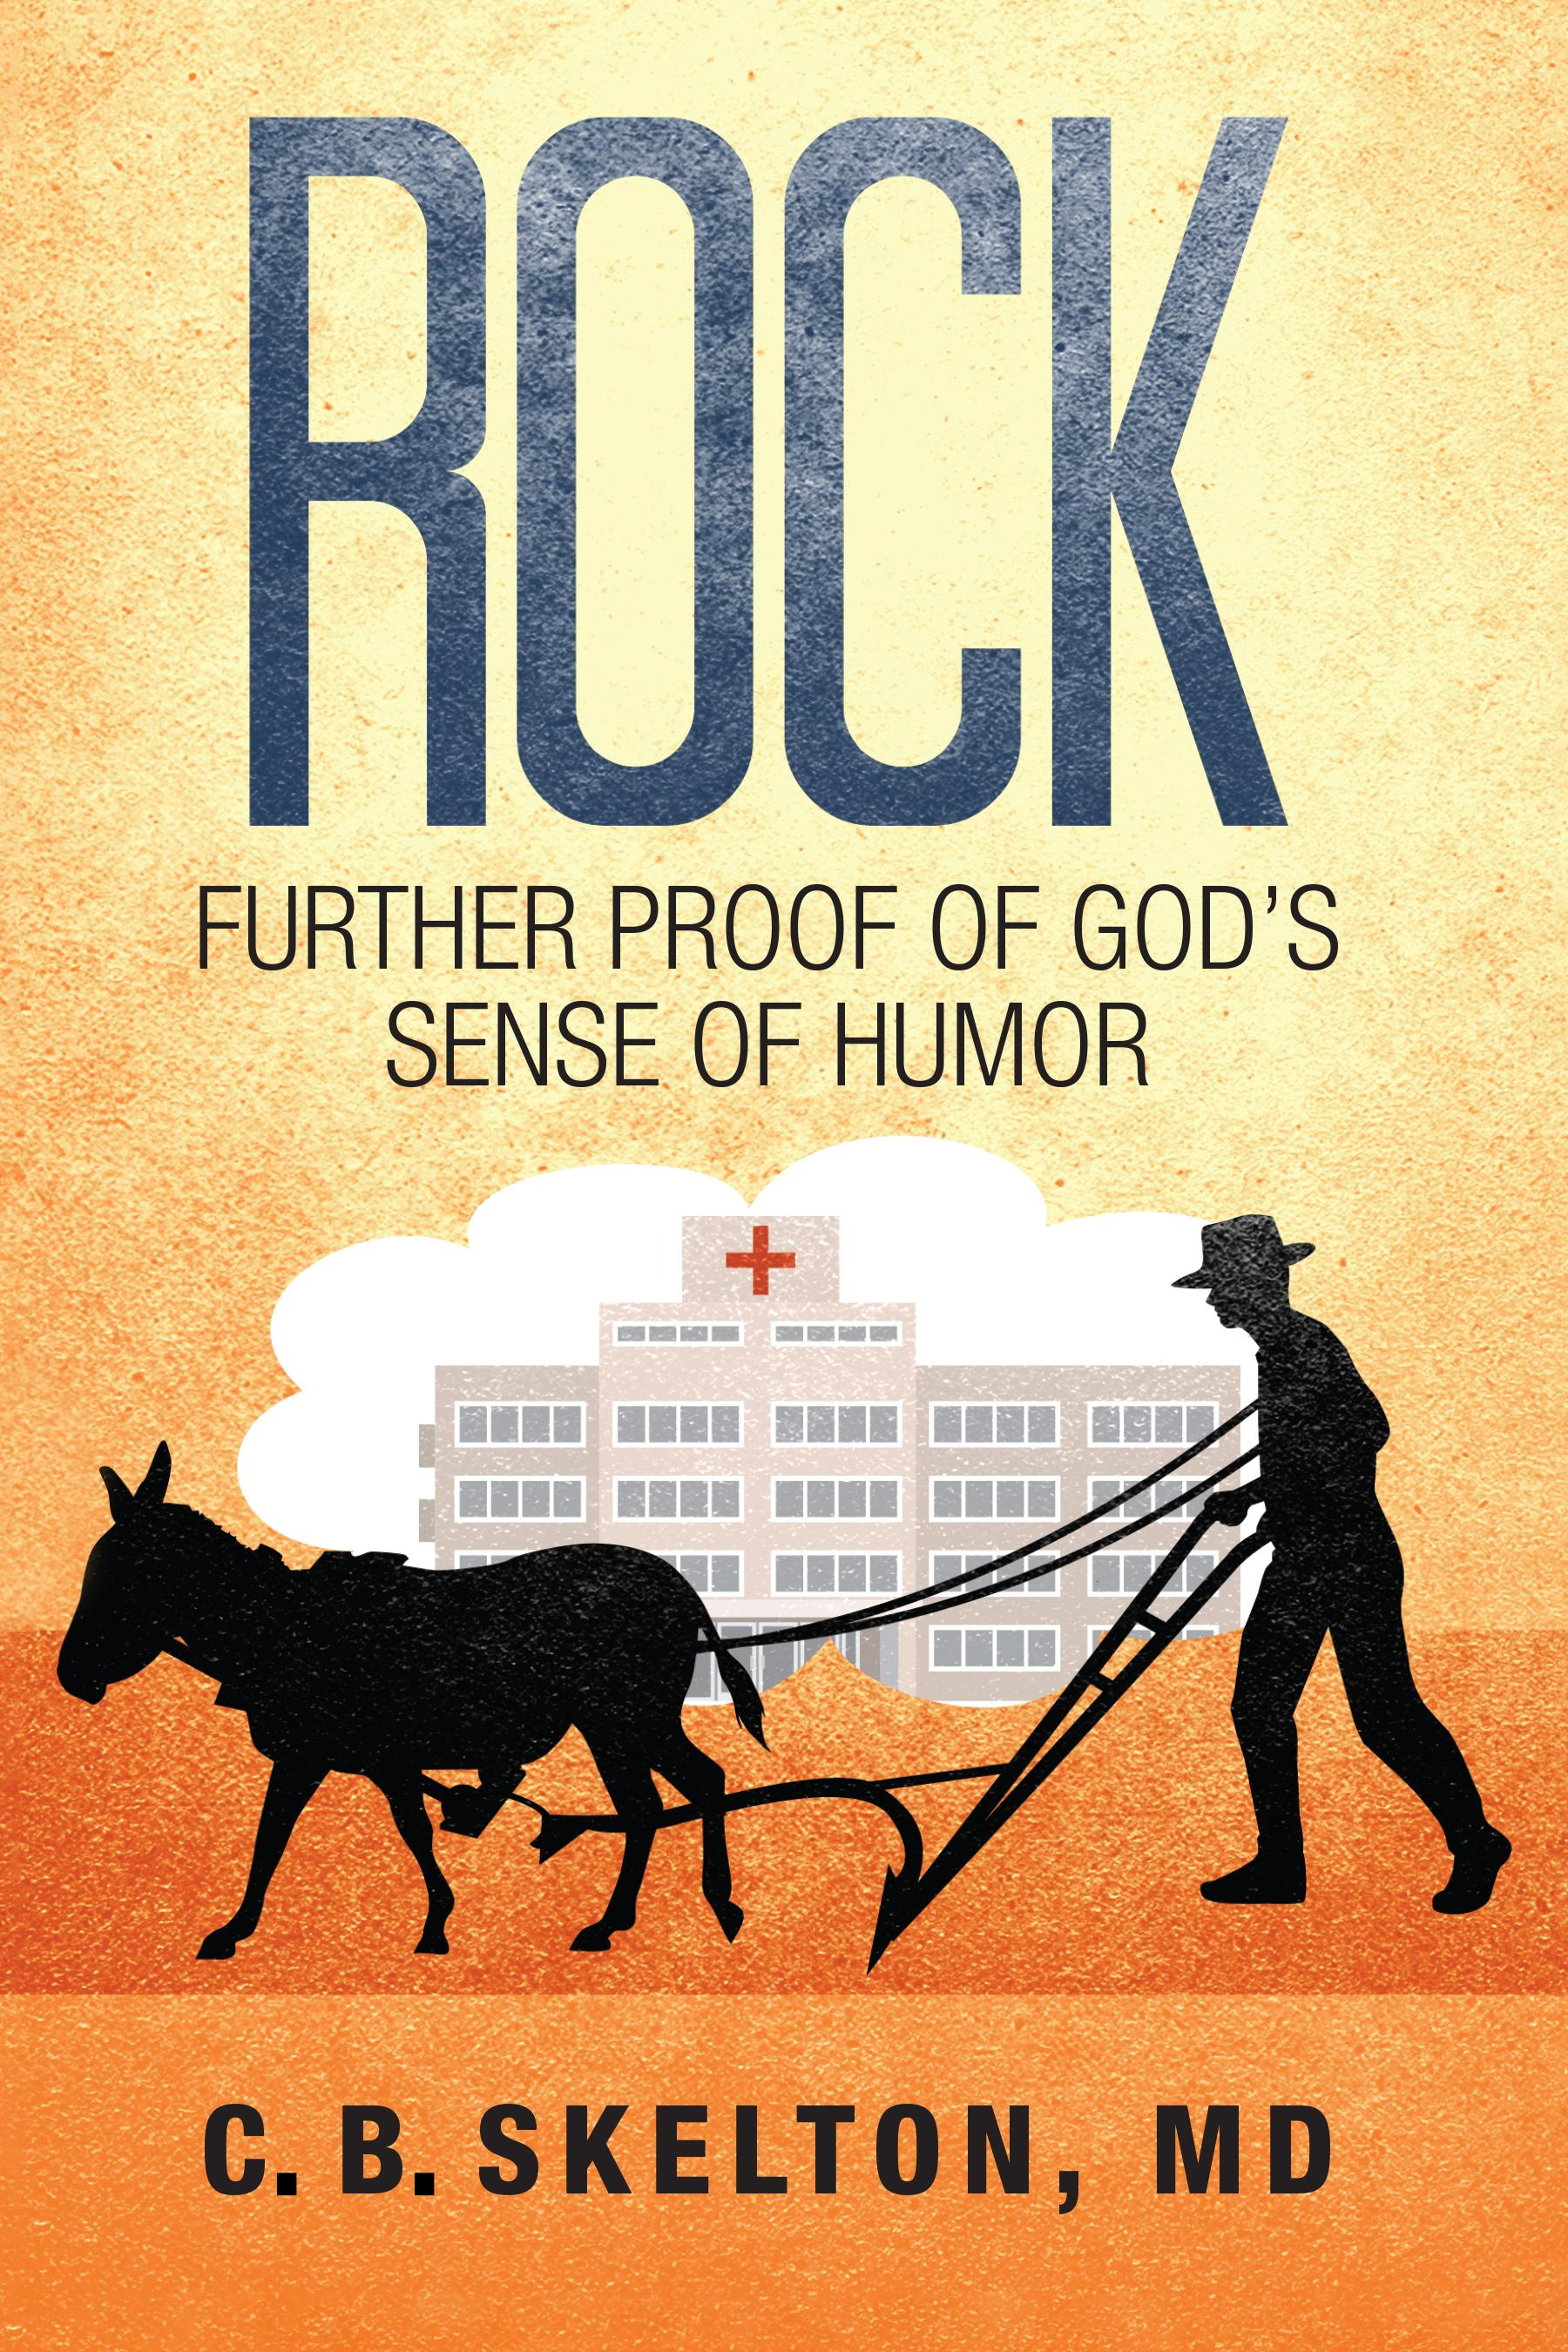 ROCK, FURTHER PROOF OF GOD'S SENSE OF HUMOR